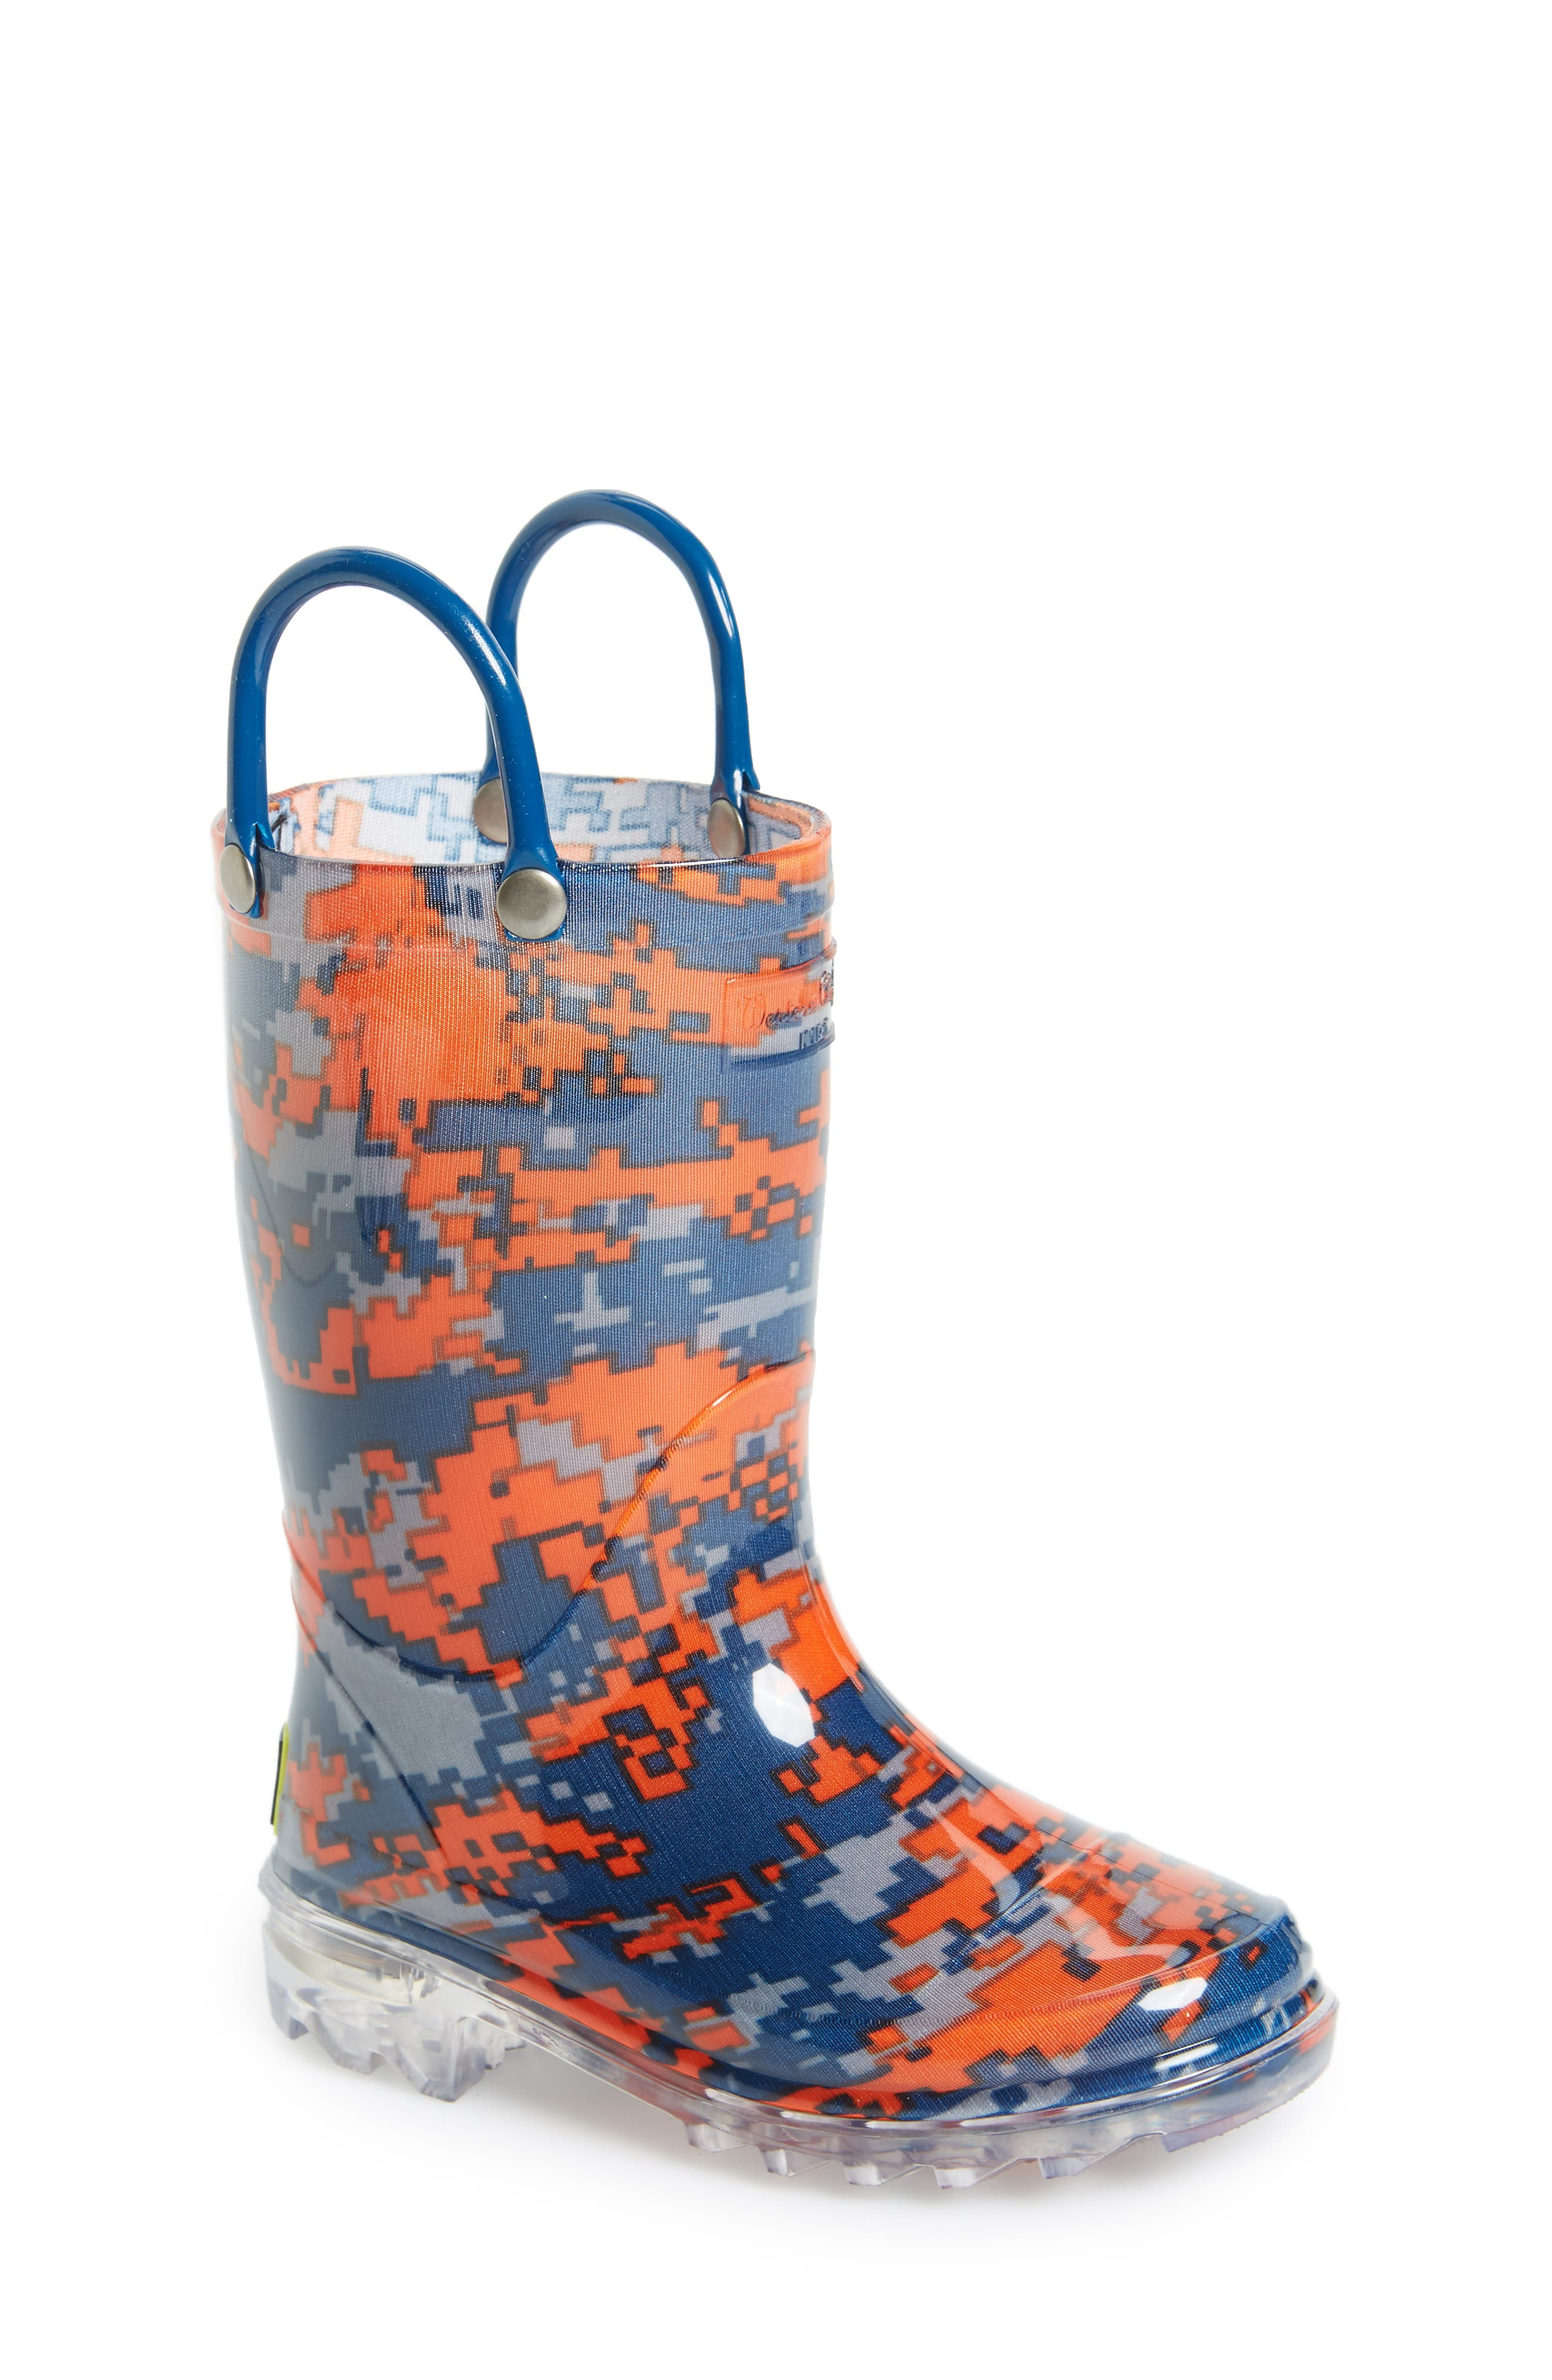 Main Image - Western Chief Digital Camo Light-Up Rain Boot (Toddler & Little Kid)